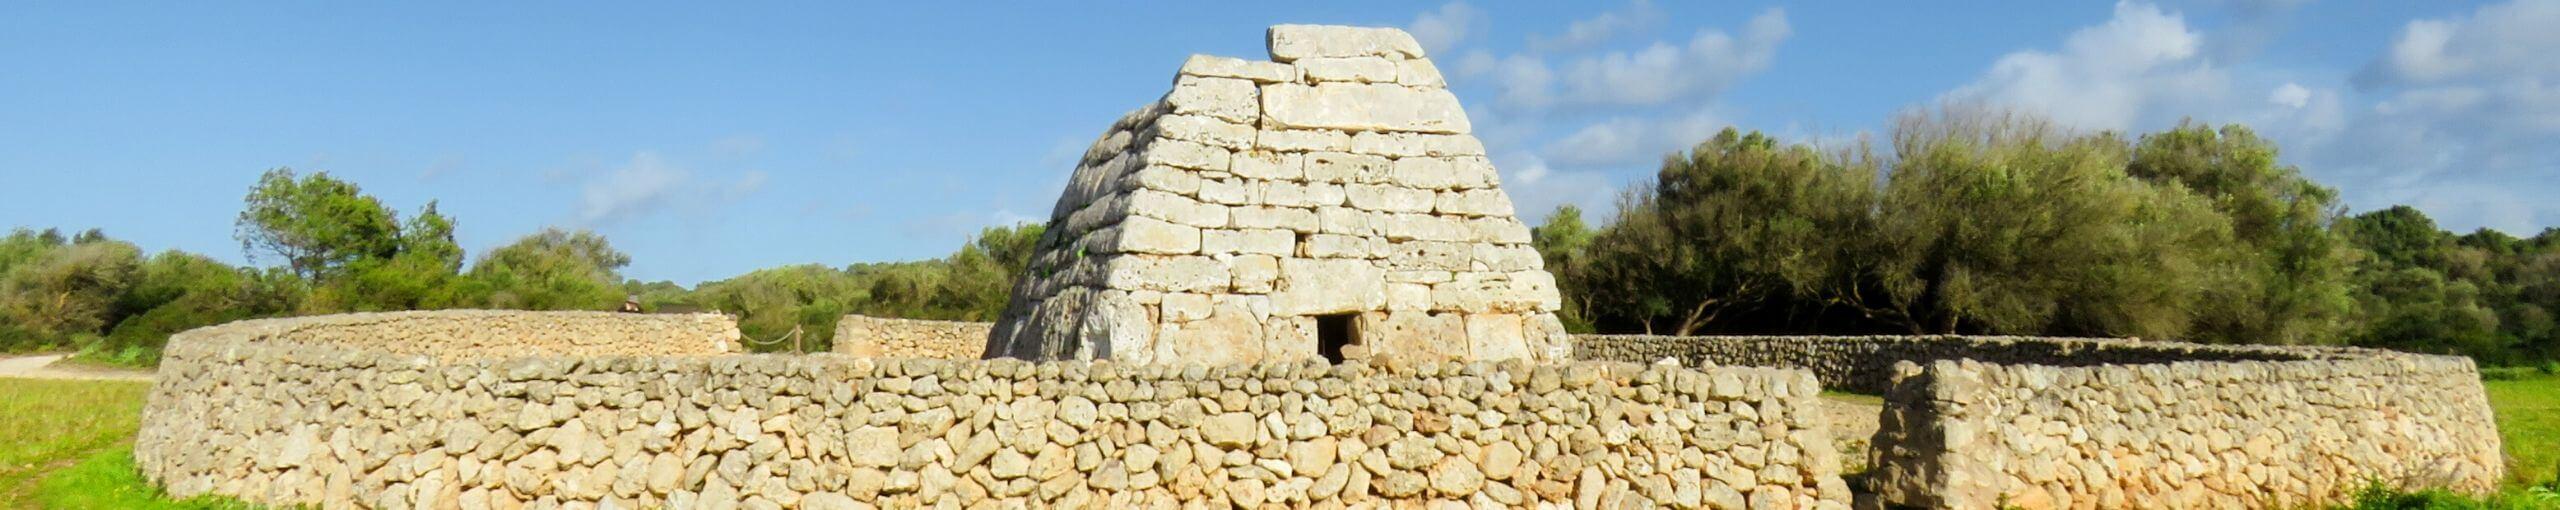 Siete días en Menorca. Naveta des Tolons, Menorca.